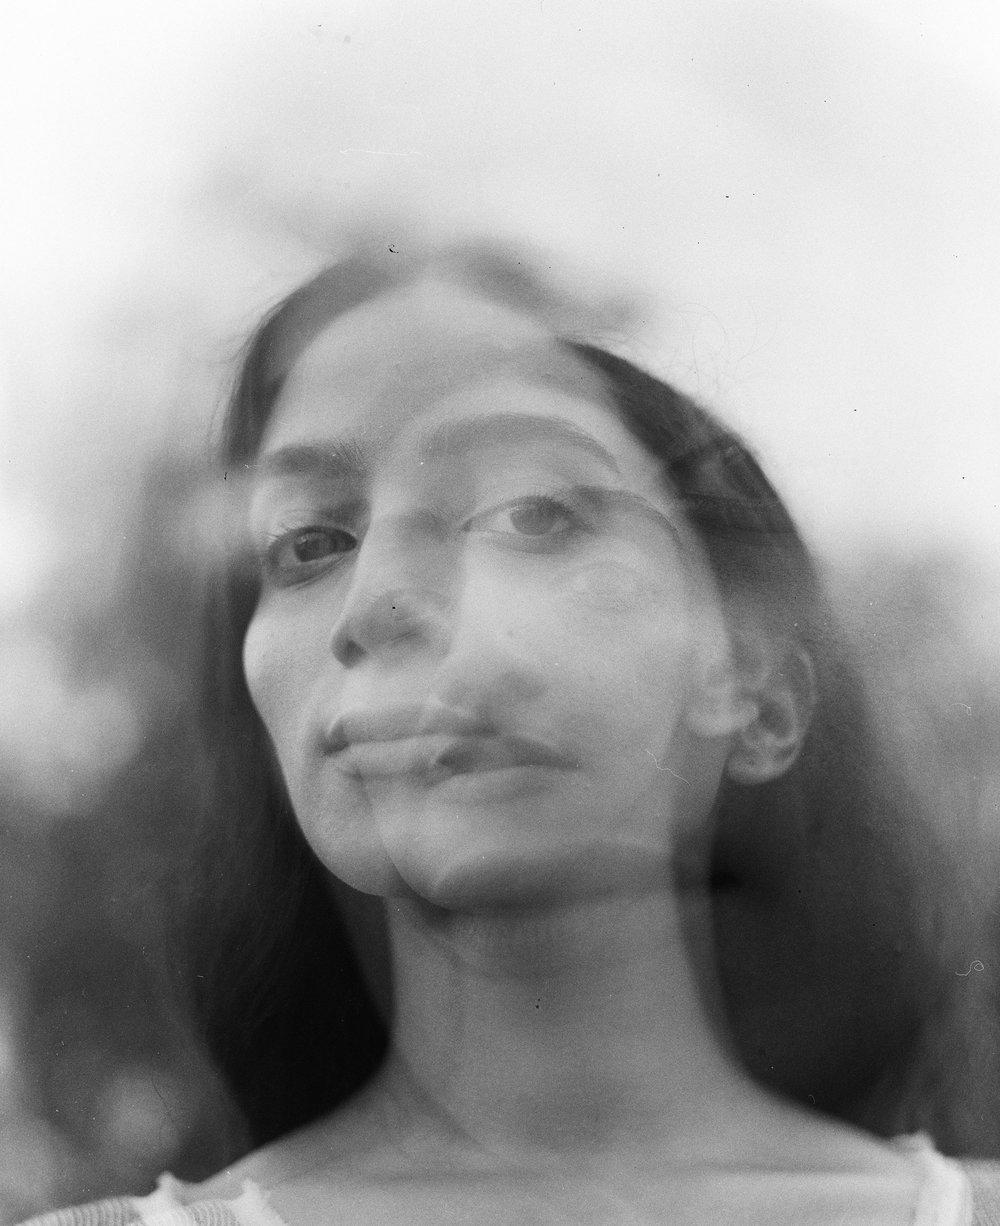 madhavan_palanisamy_portrait.jpg